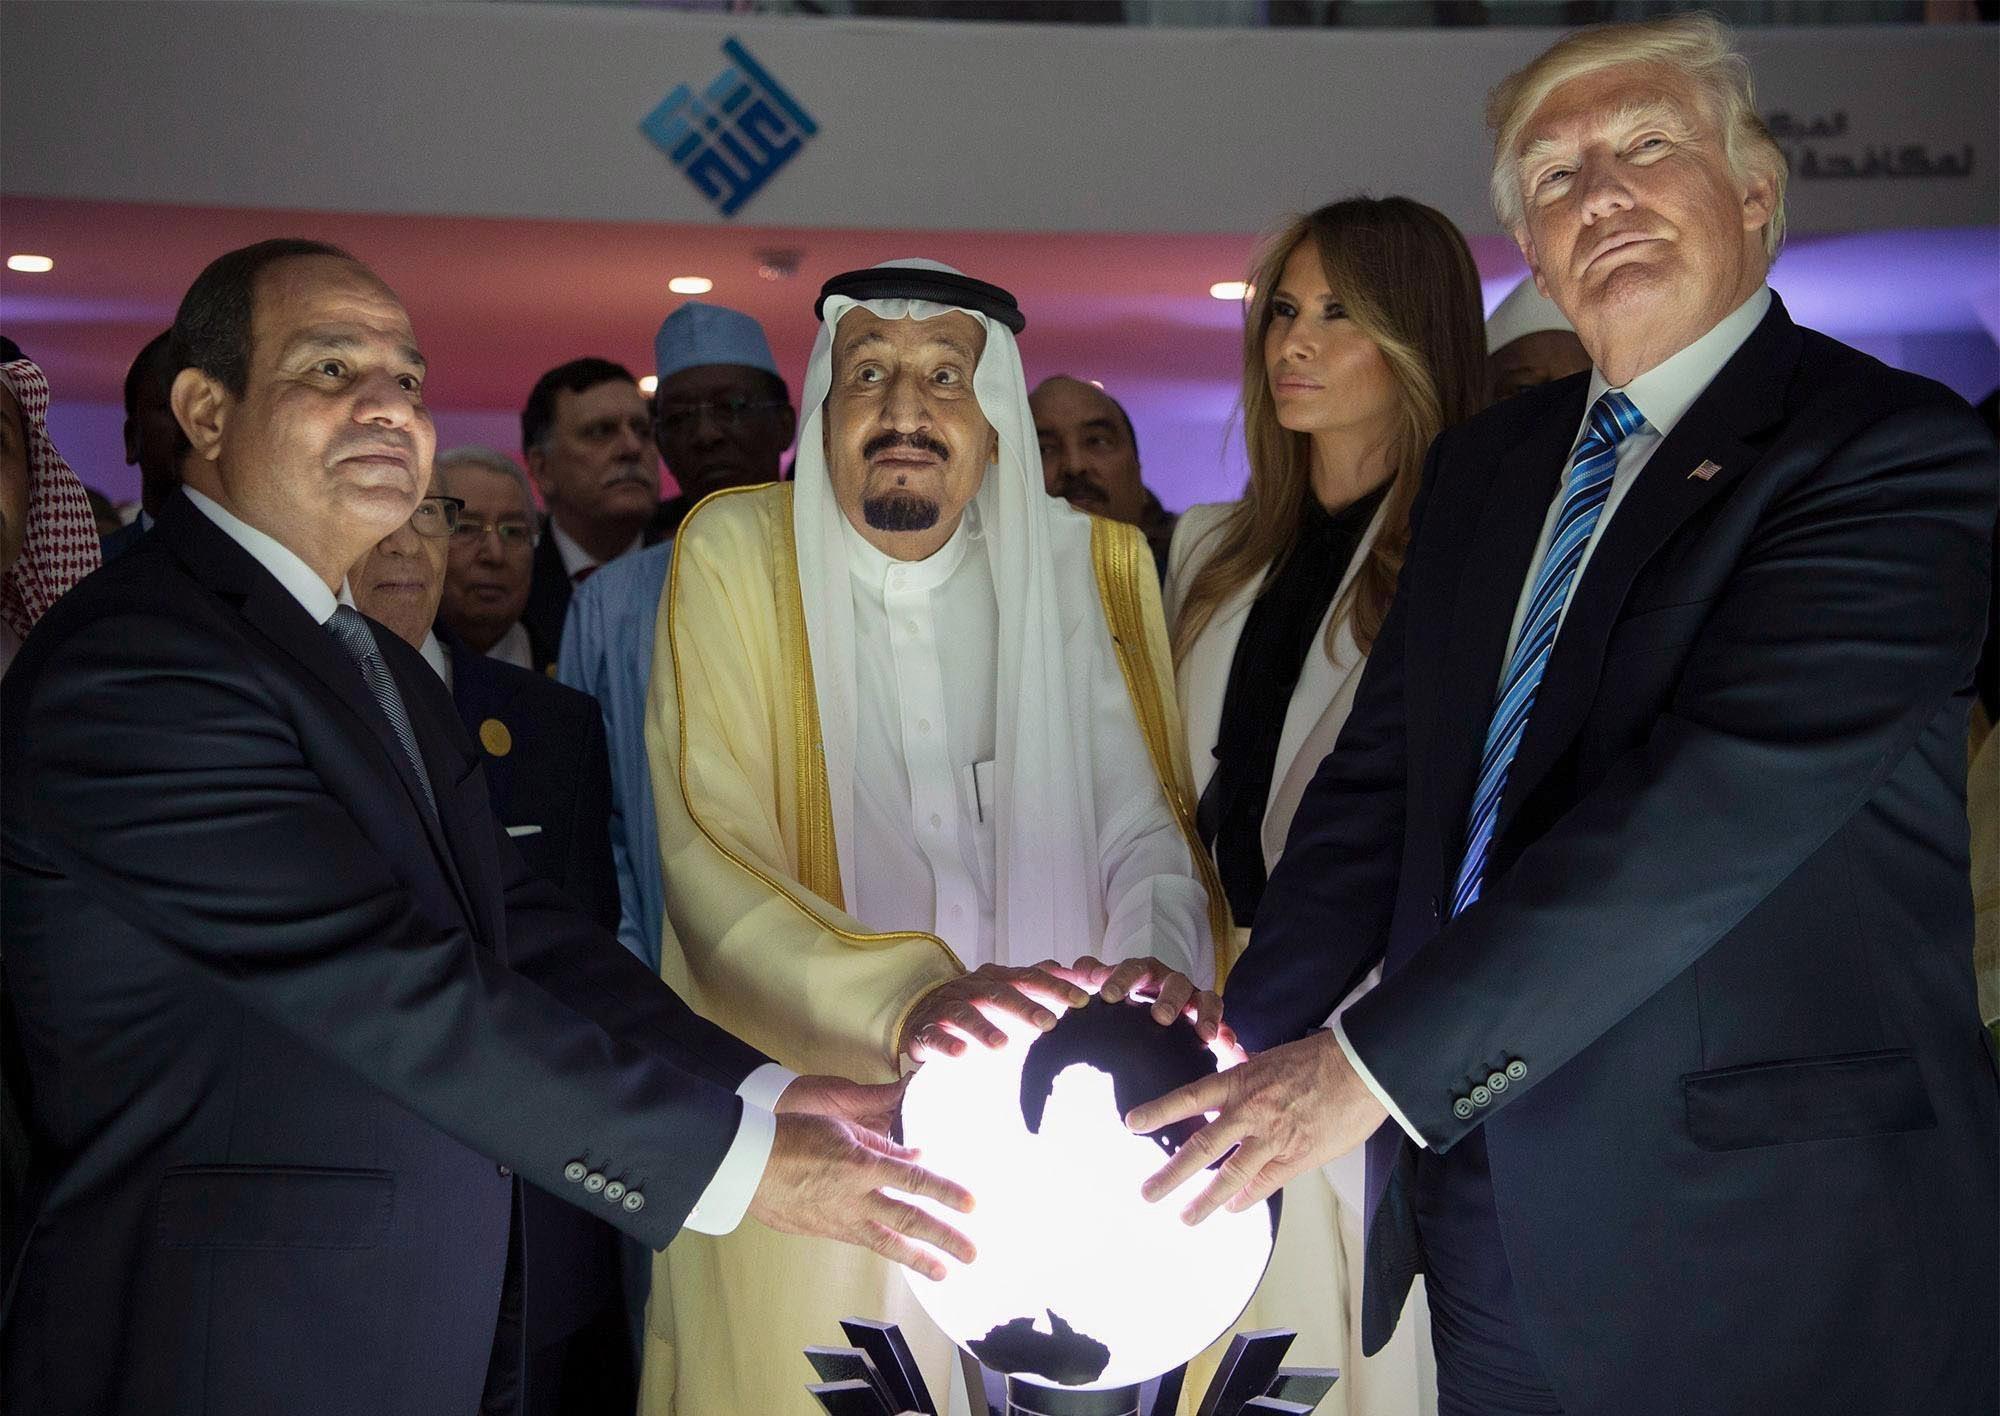 la-the-gcc-summit-in-saudi-arabia-20170521